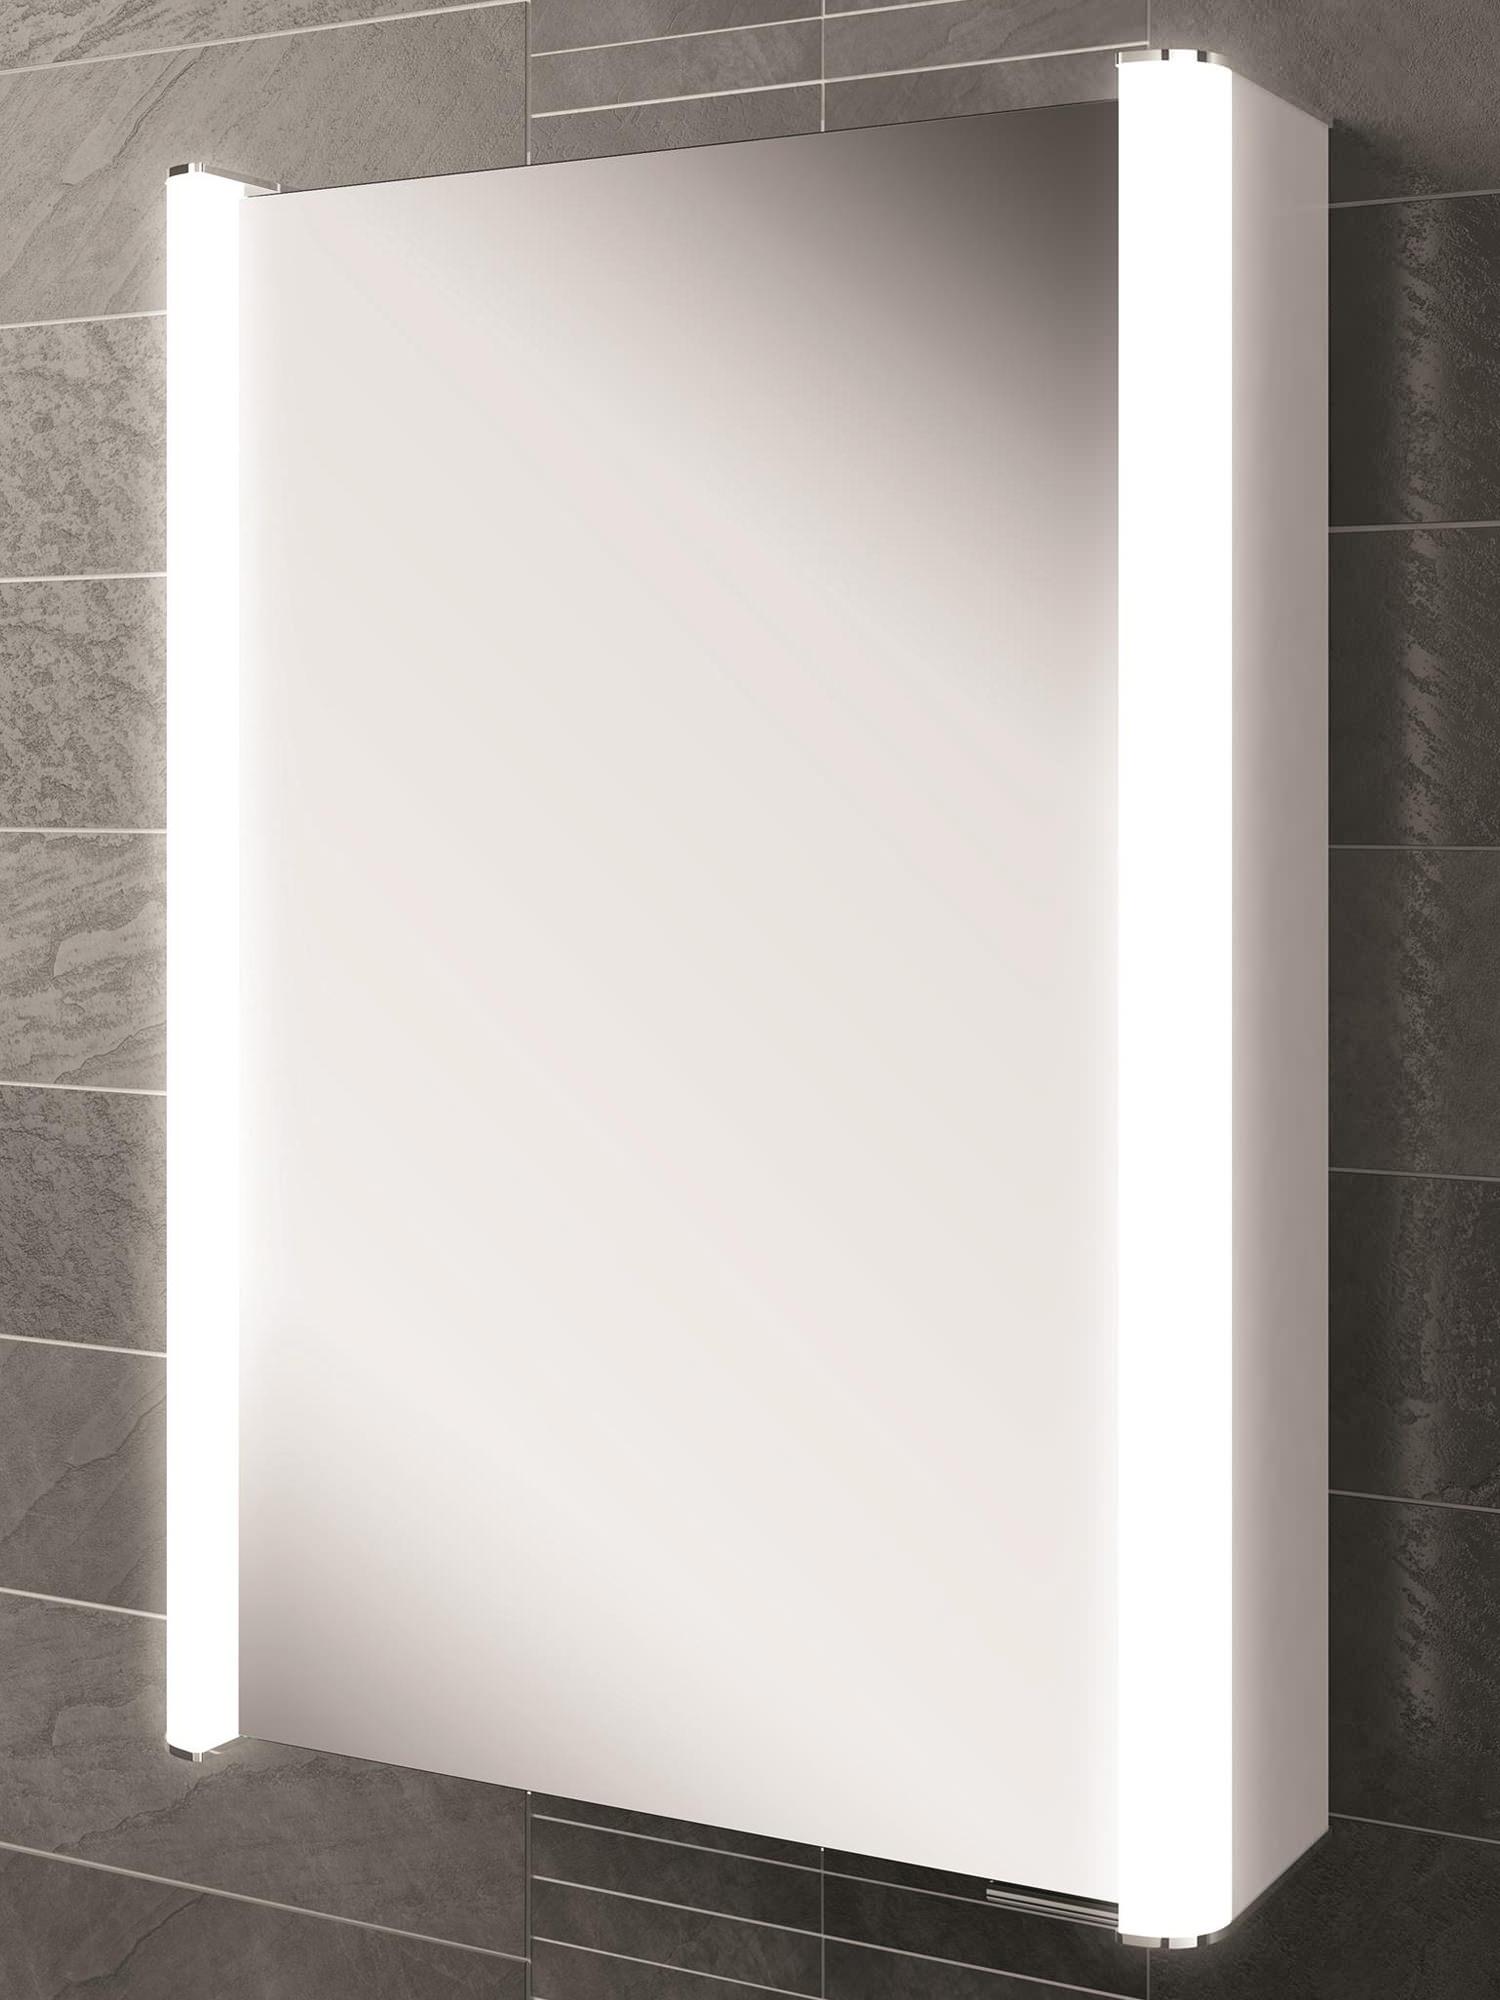 hib vita 50 single door led illuminated aluminium cabinet. Black Bedroom Furniture Sets. Home Design Ideas